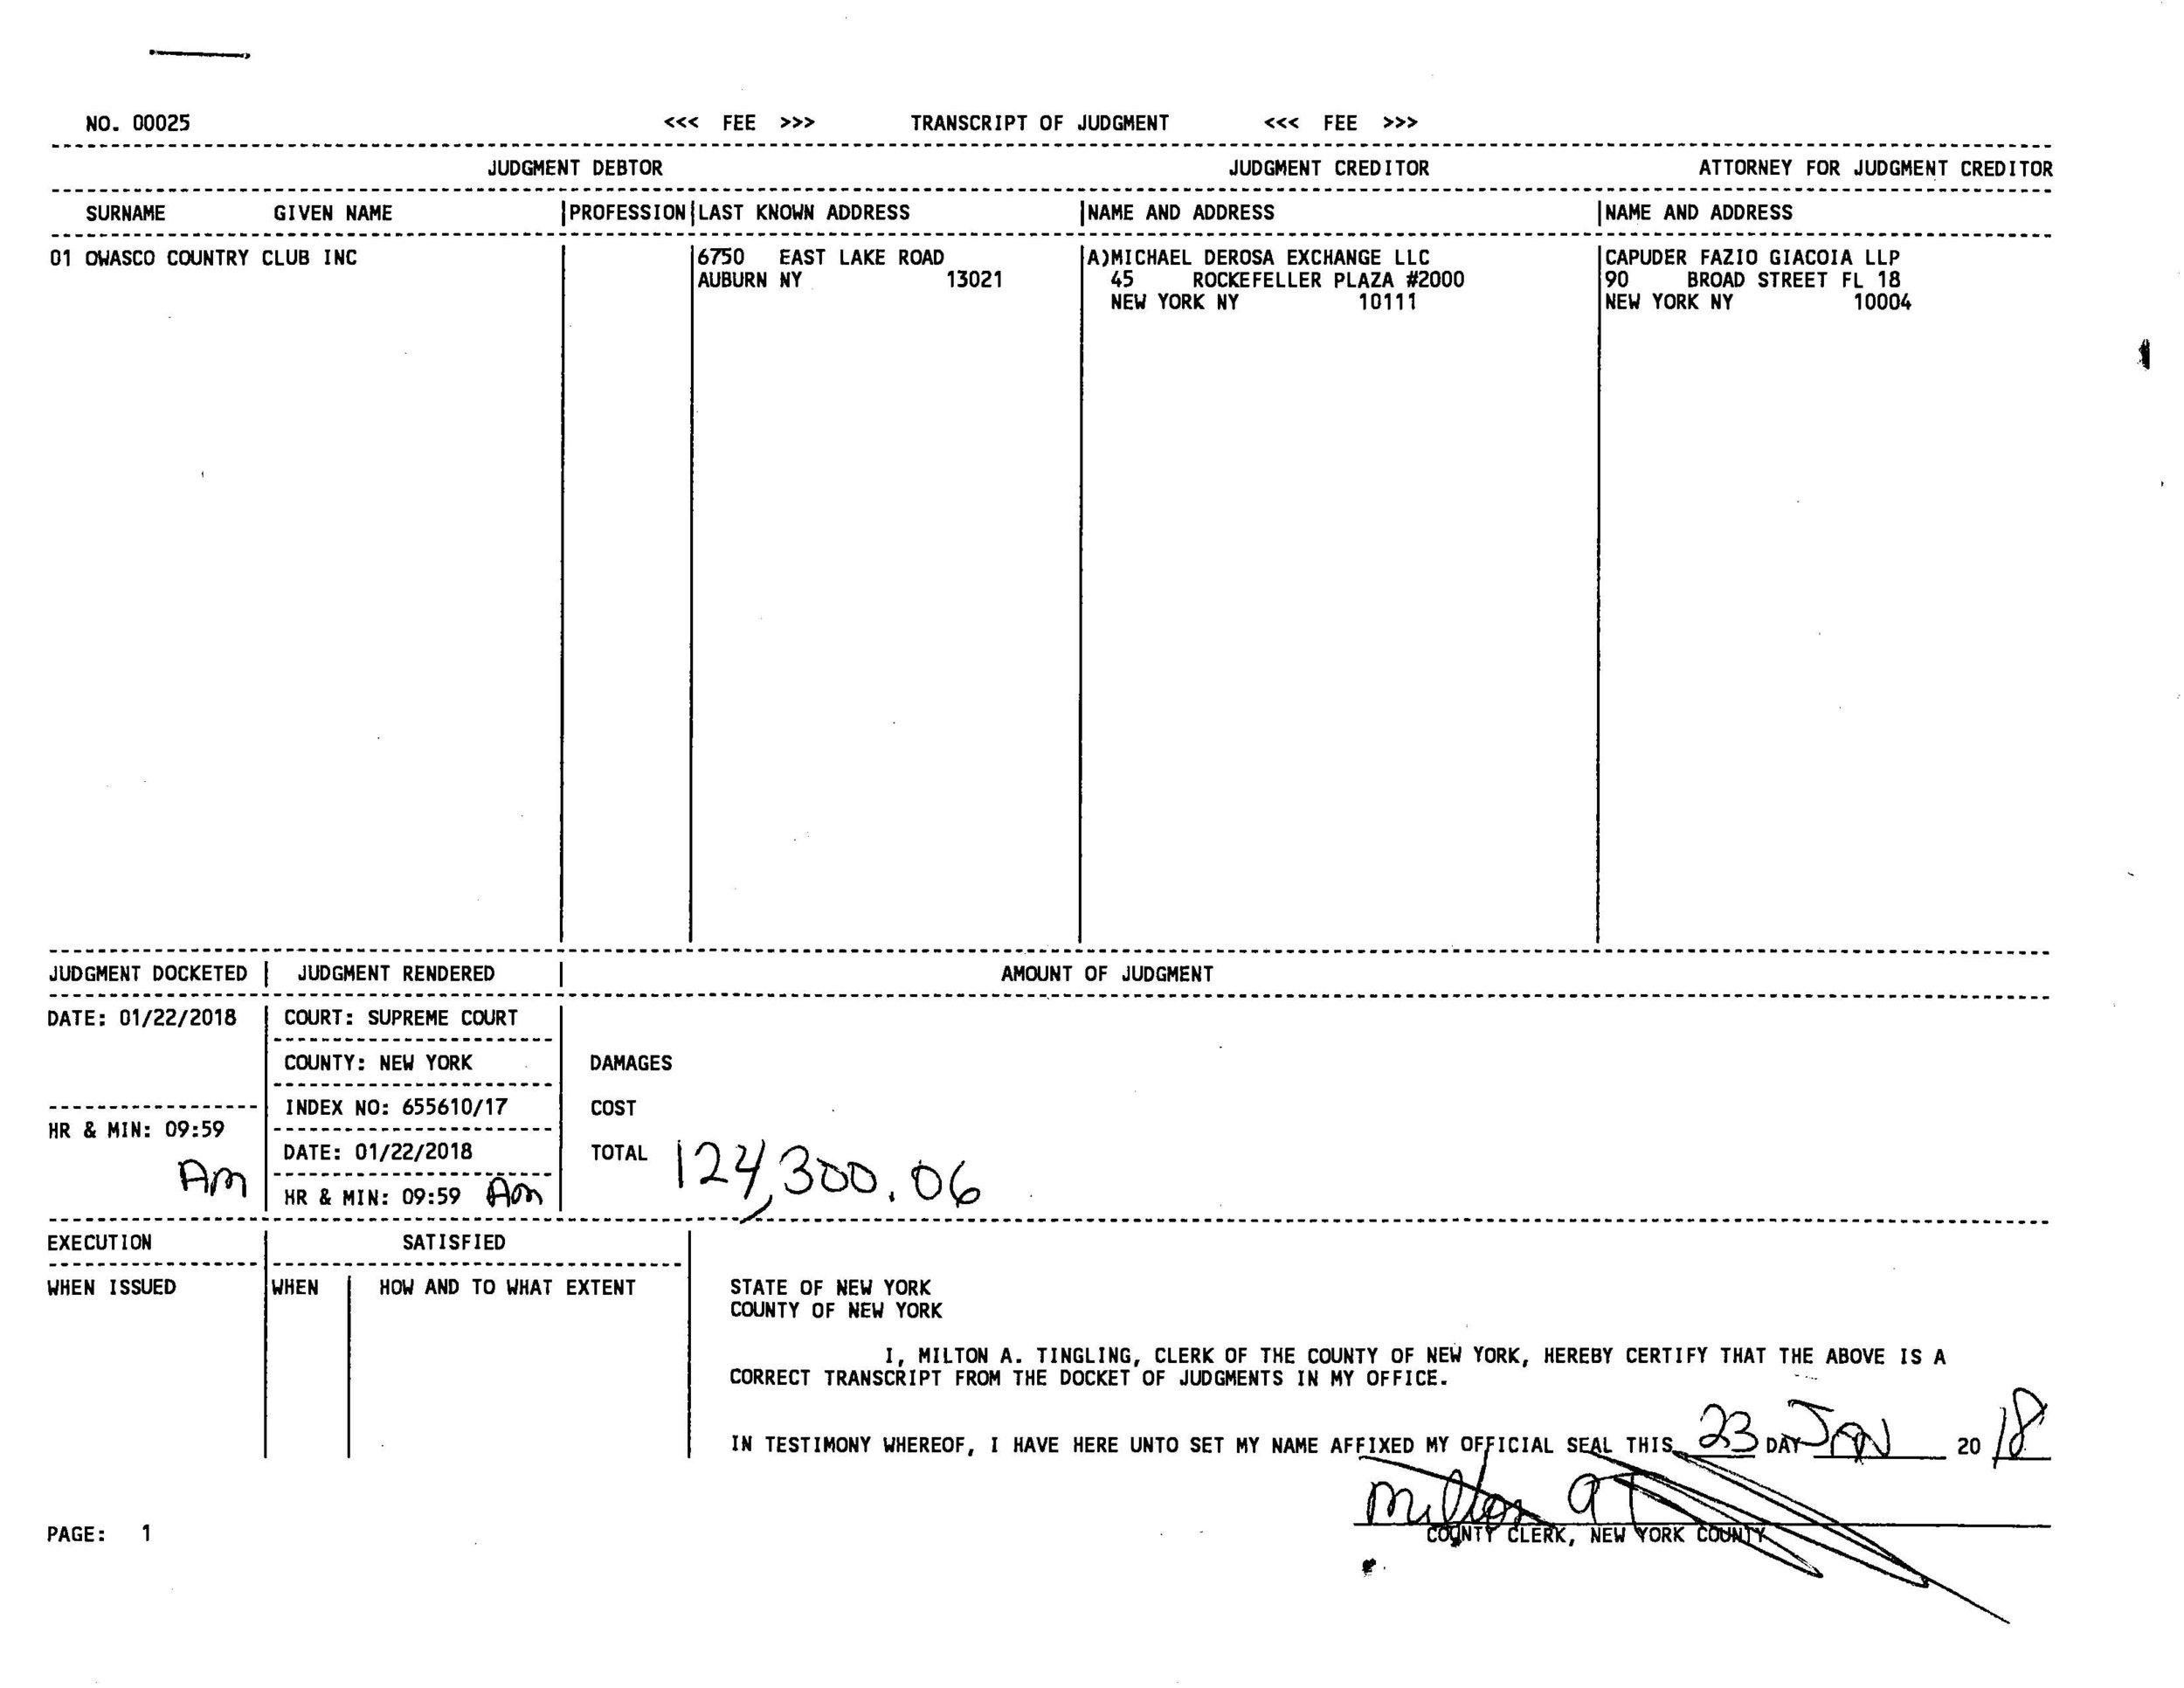 Transcript of Judgment (Michael DeRosa Exchange, LLC vs Owasco Country Club, Inc.)_Page_1.jpg